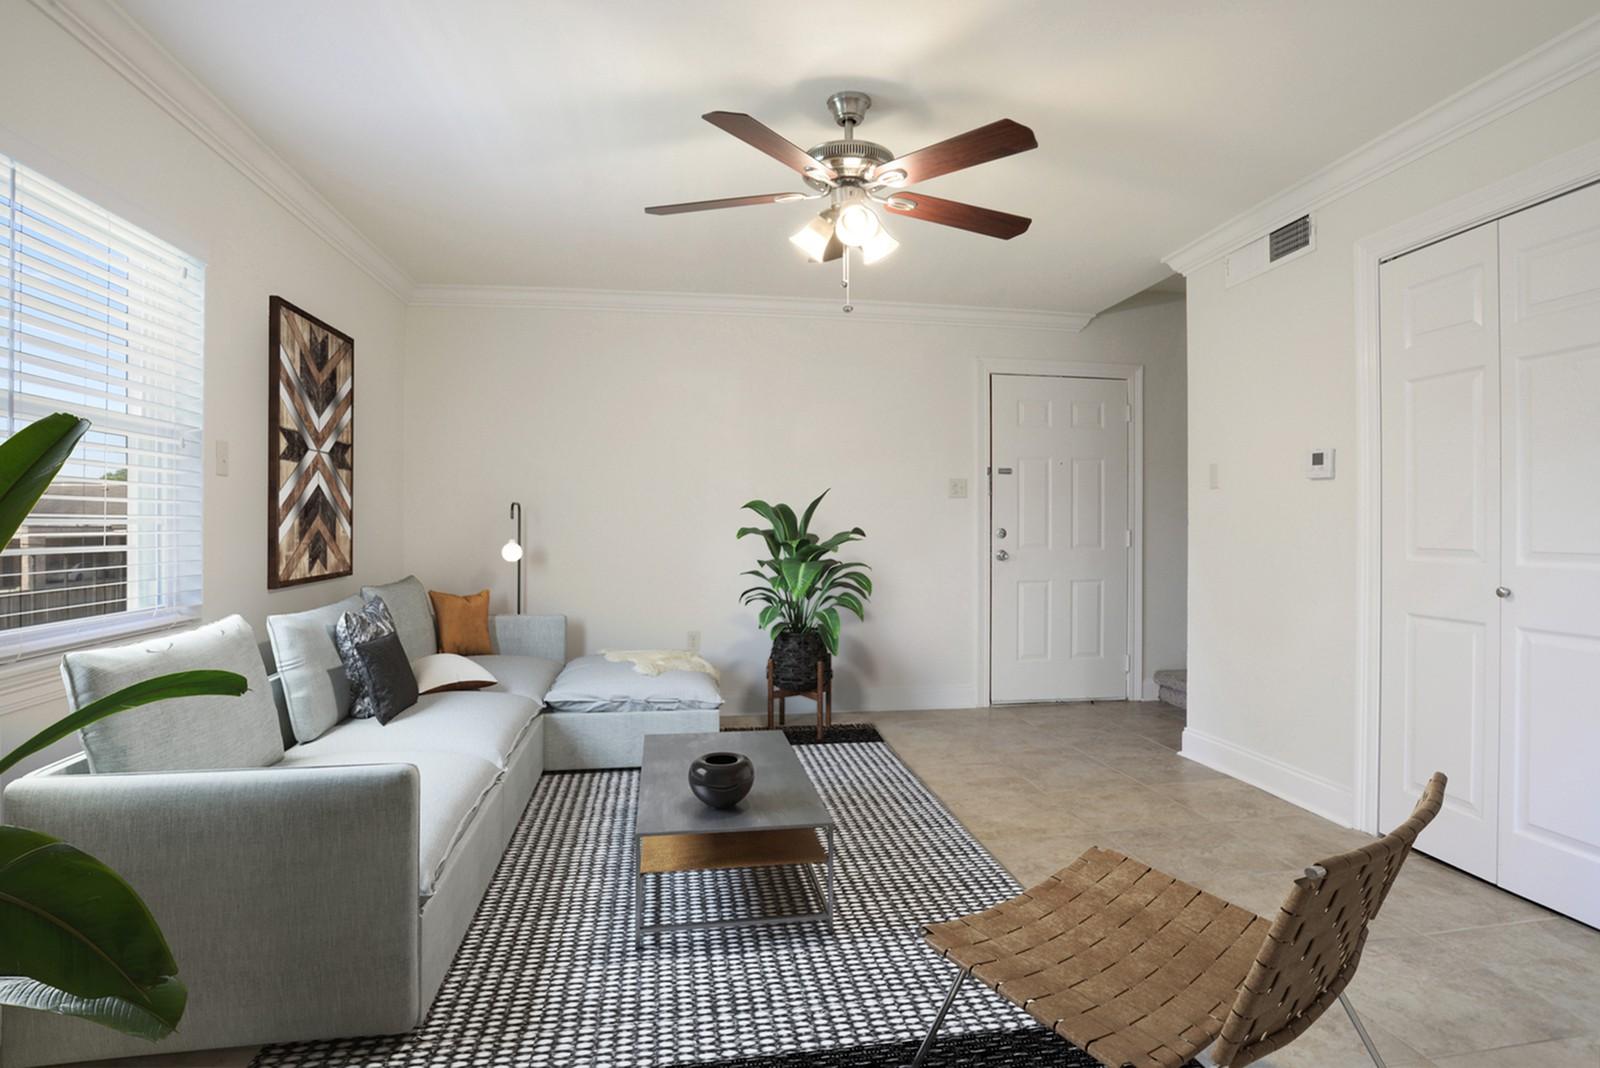 Apartments Near Louisiana The Warwick - Utilities Included for Louisiana Students in , LA